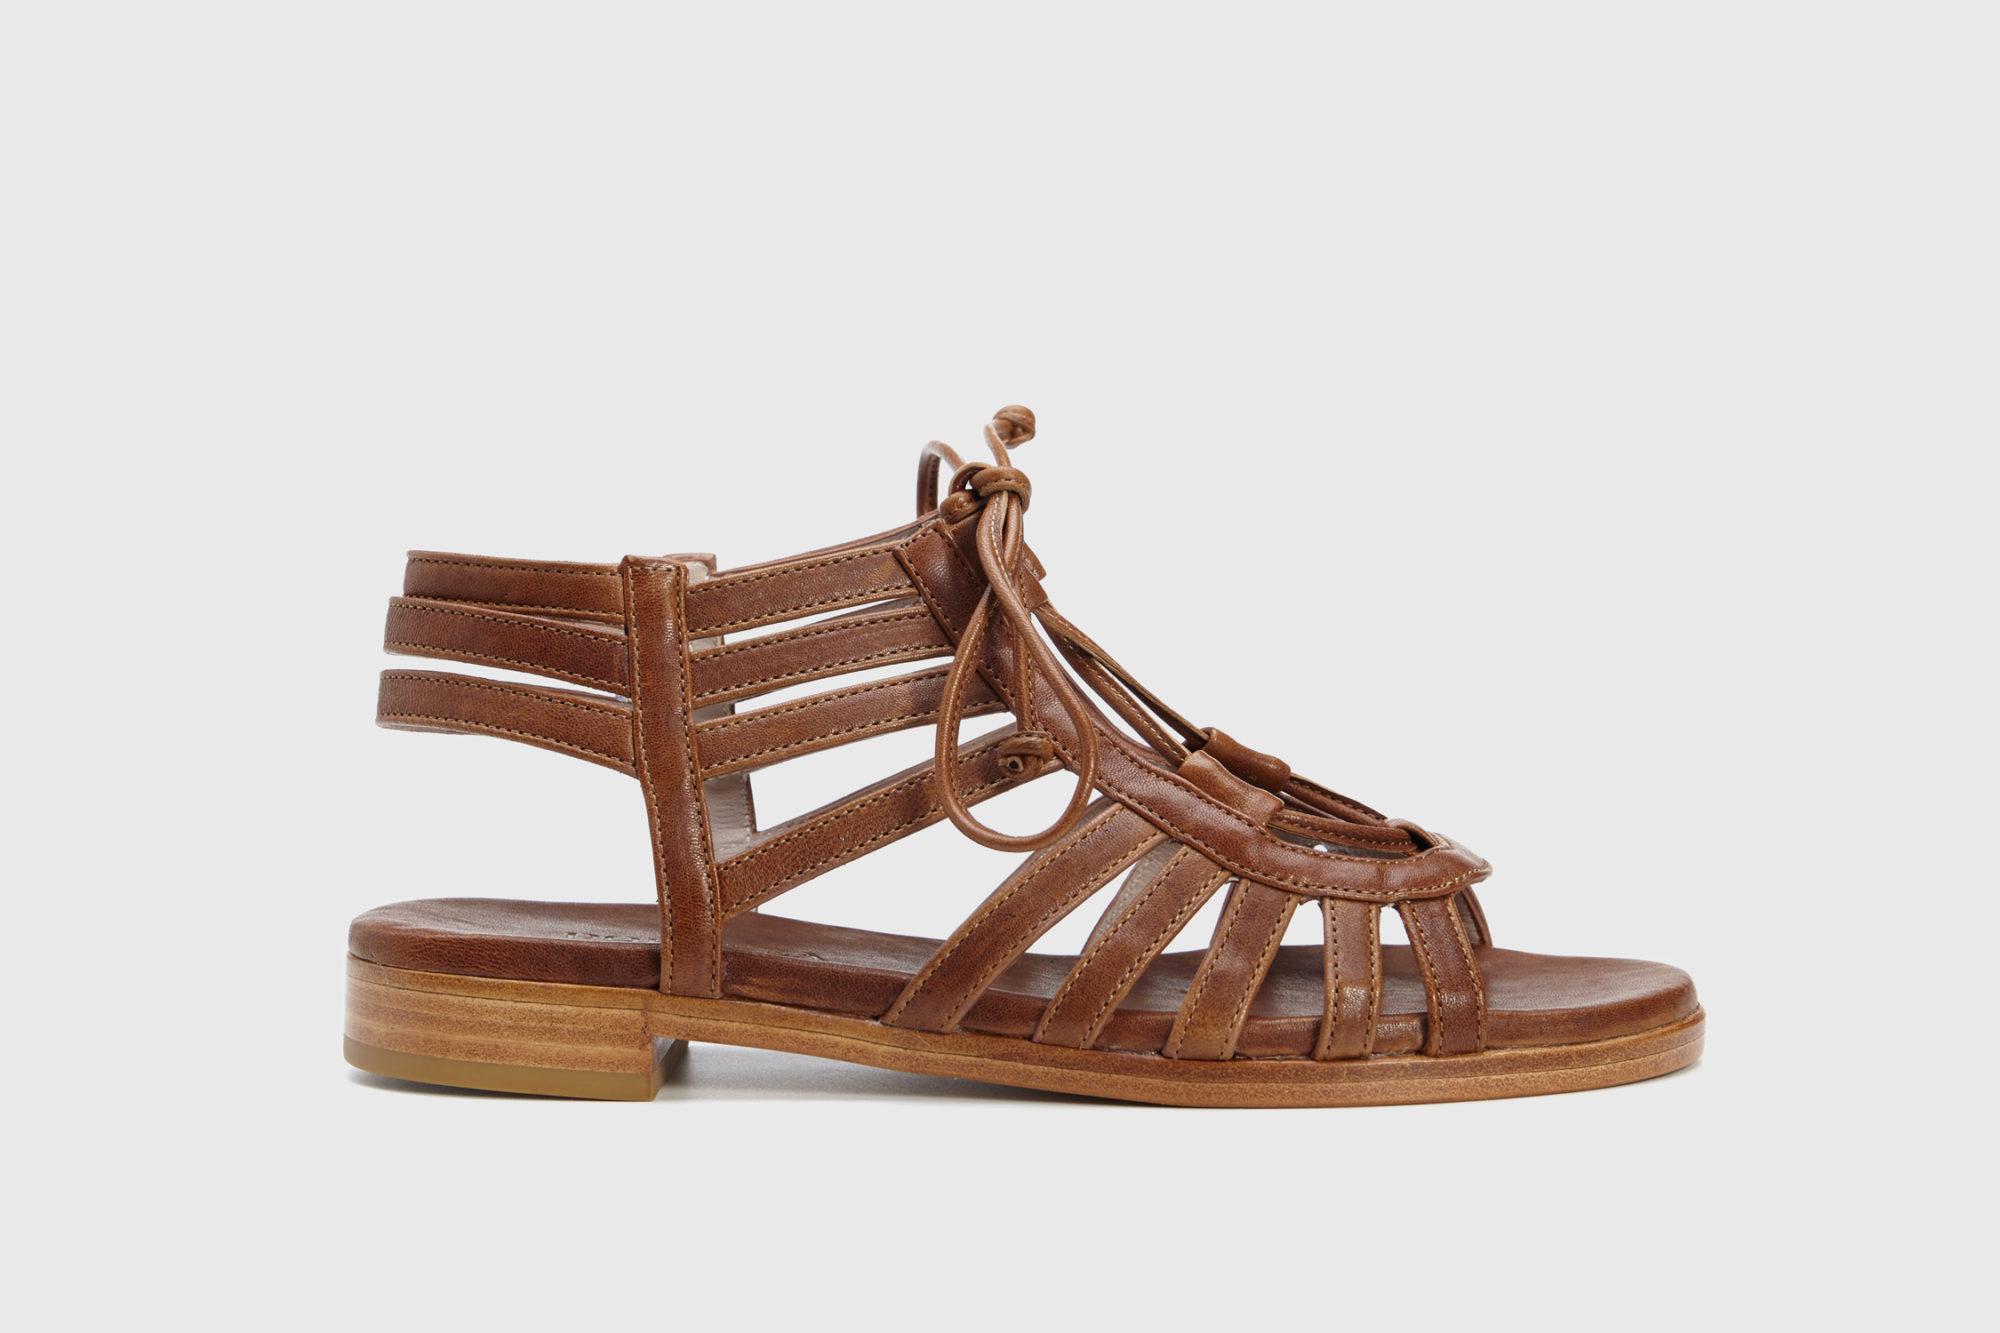 Dorotea sandalia plana Margot cuero ss18 perfil